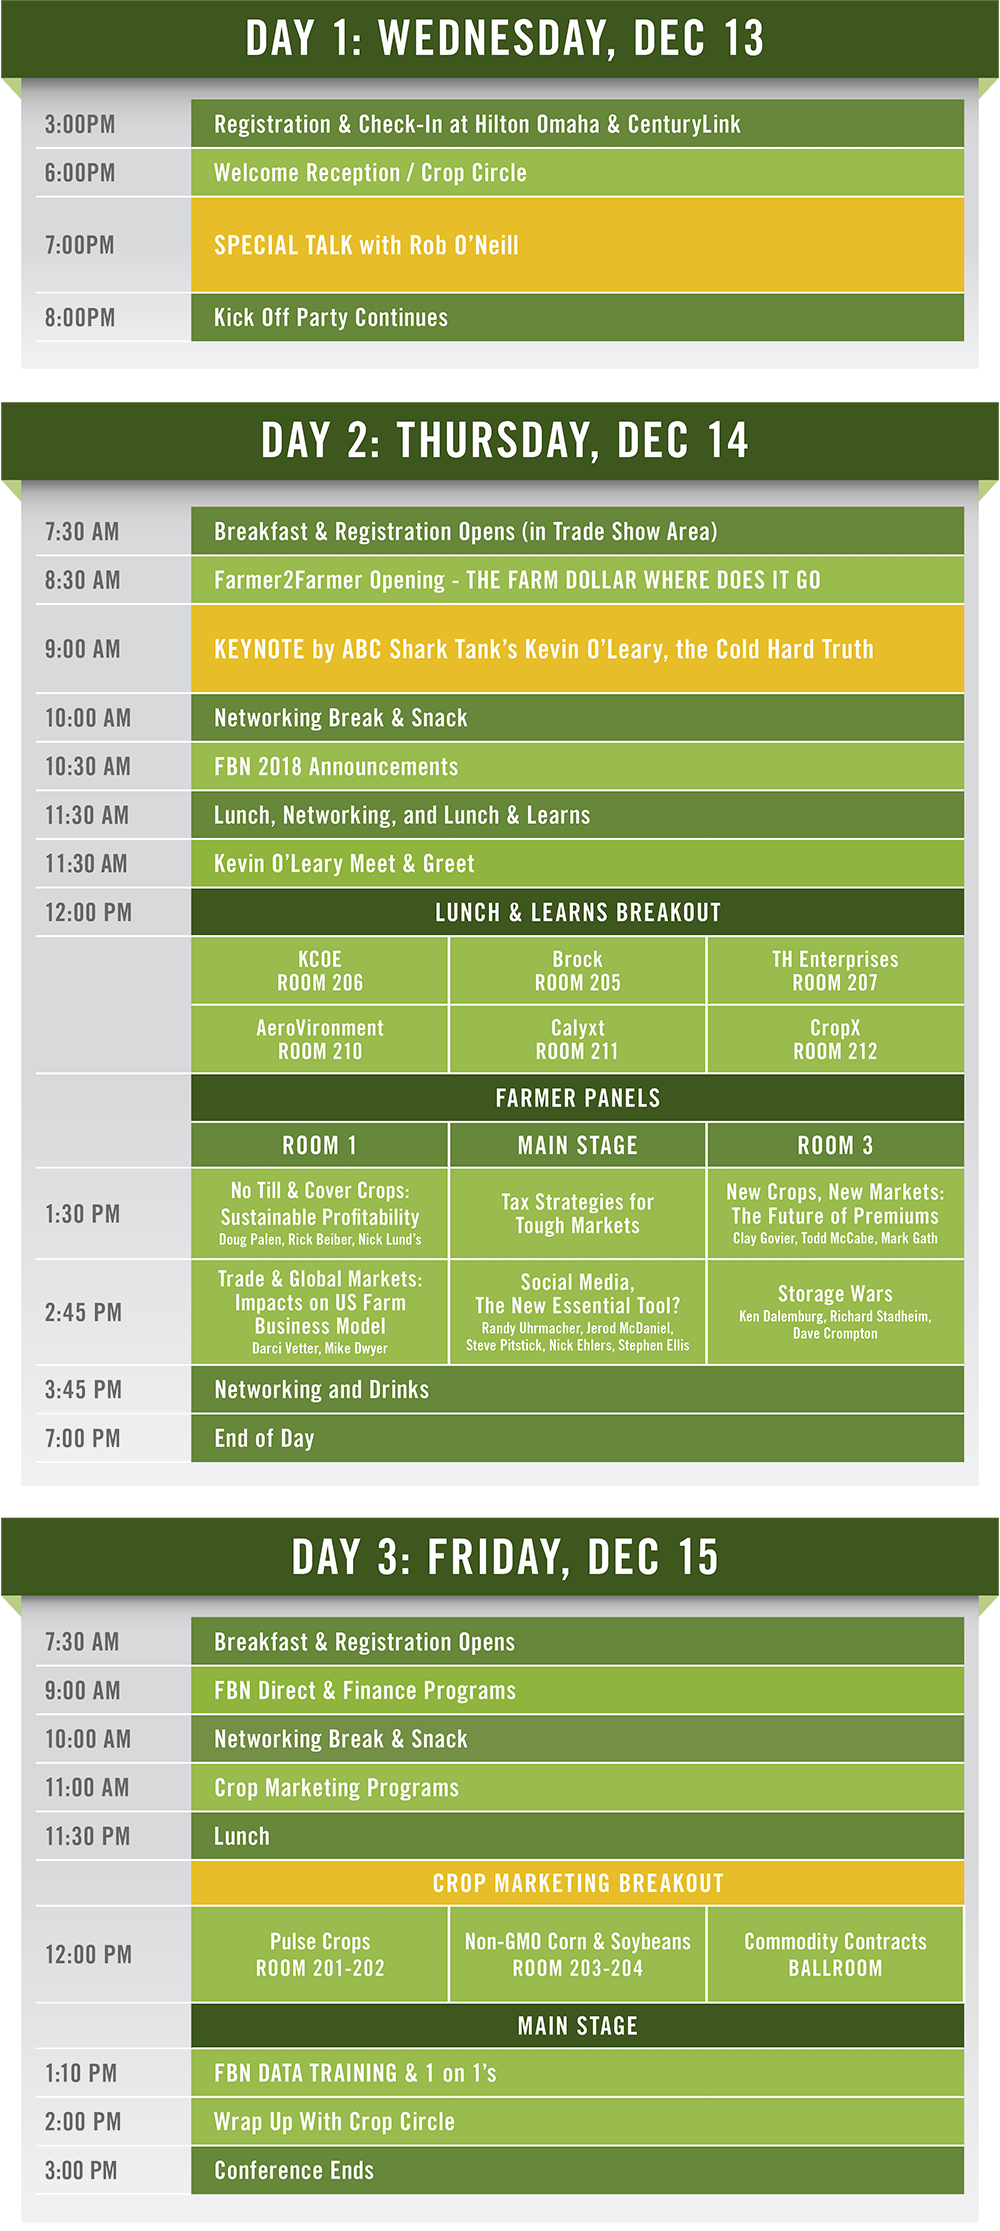 171121 F2F17 Schedule Board Green_Web (2).png